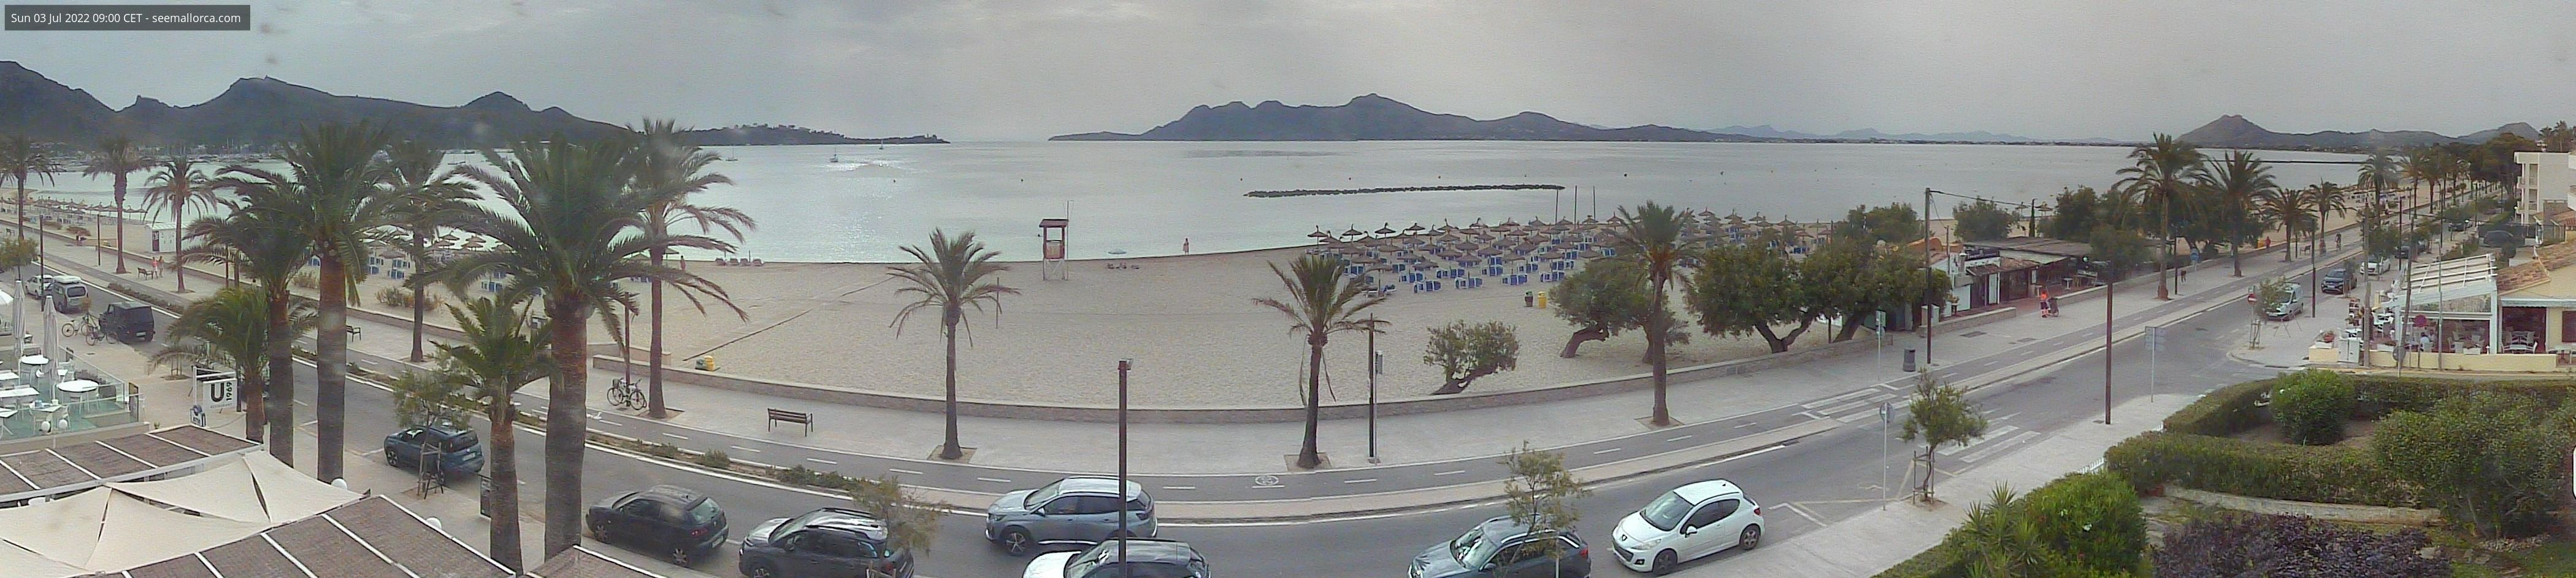 Port de Pollença (Vsita Panoramica)